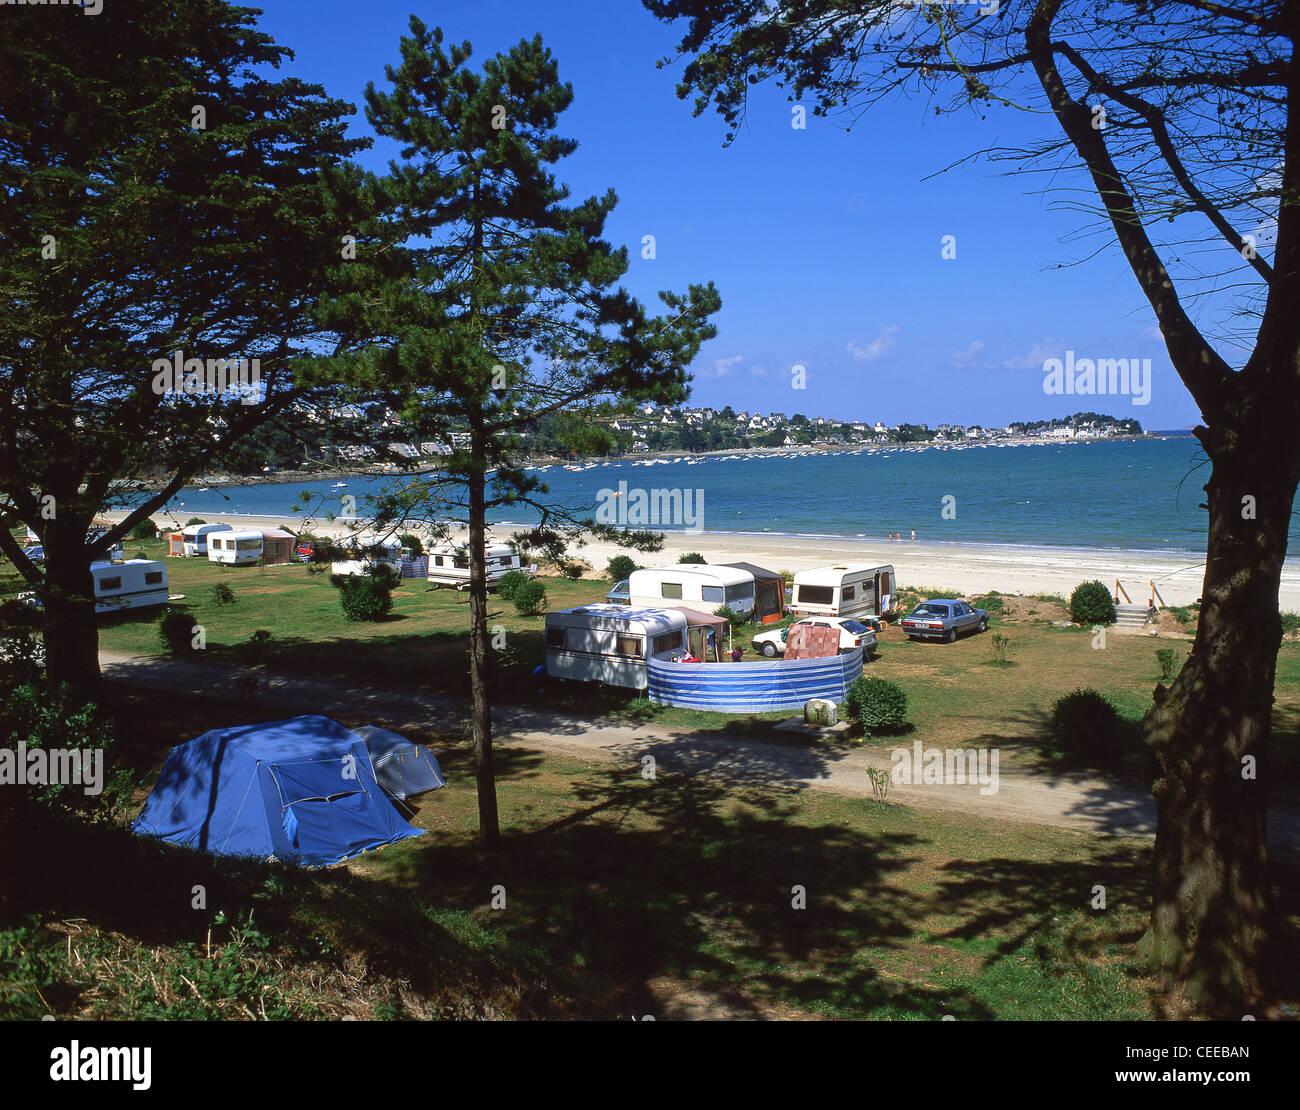 Municipal campsite, Locquirec, Finistère, Brittany, France - Stock Image